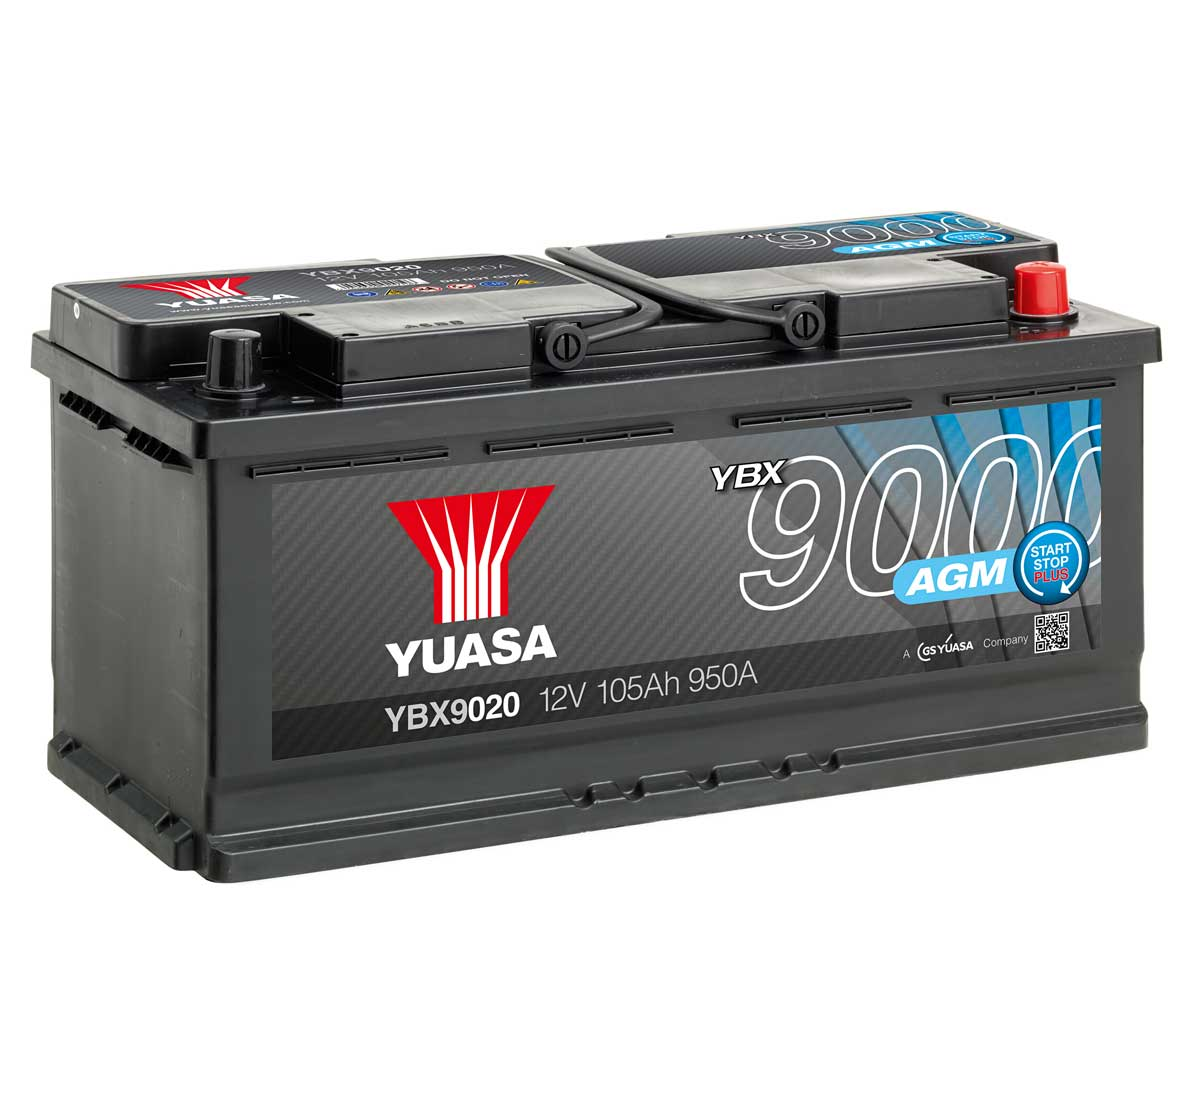 yuasa ybx9020 agm 12v car battery mds battery. Black Bedroom Furniture Sets. Home Design Ideas